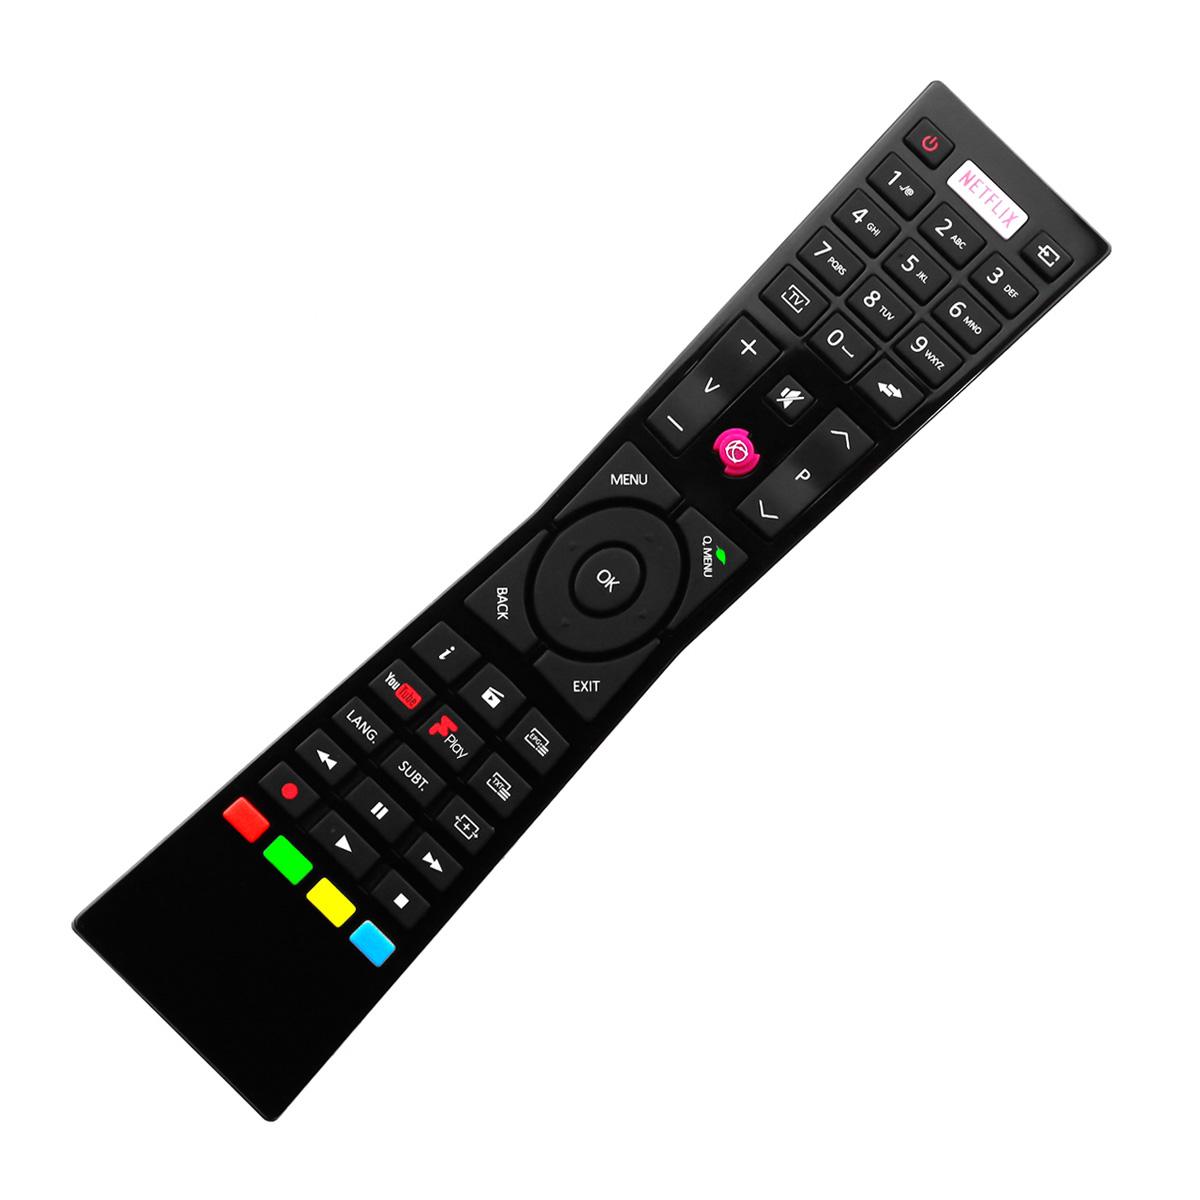 original fernbedienung remote control telefunken fernseher rc c3231 rcc3231 neu ebay. Black Bedroom Furniture Sets. Home Design Ideas